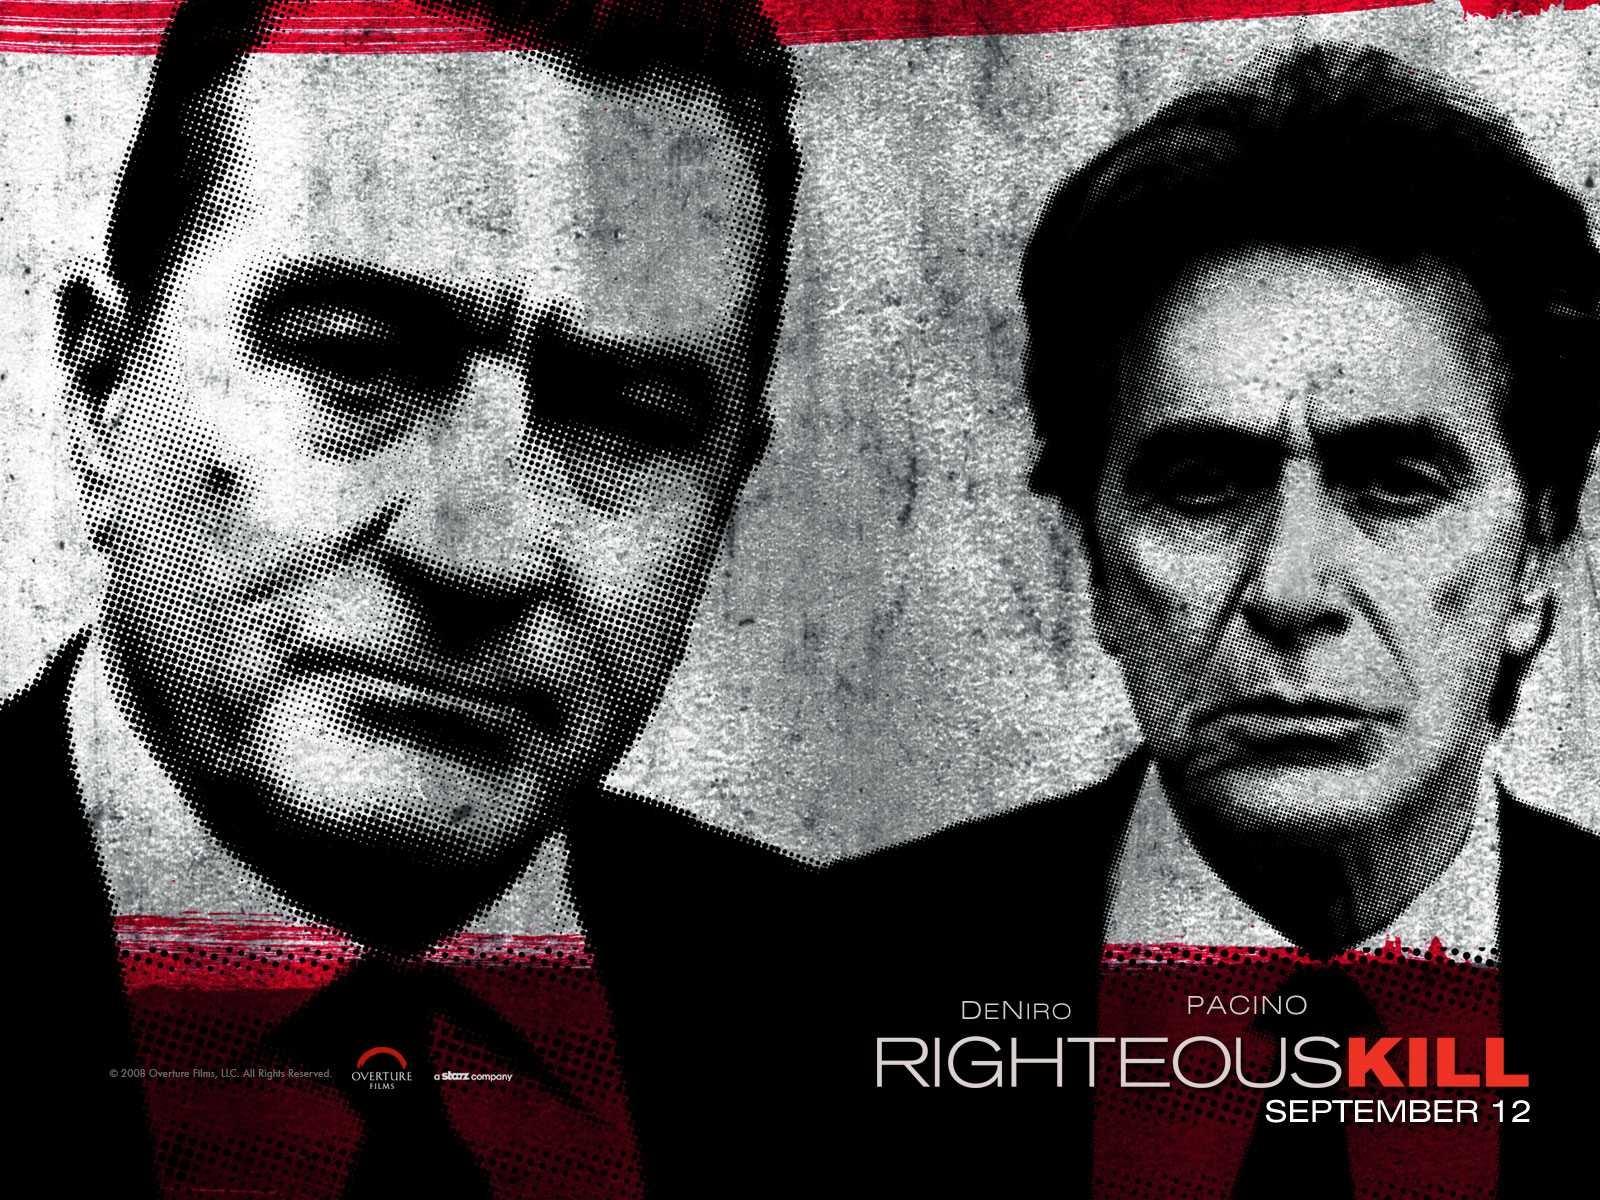 Un wallpaper del film Sfida senza regole - Righteous Kill con Robert De Niro e Al Pacino